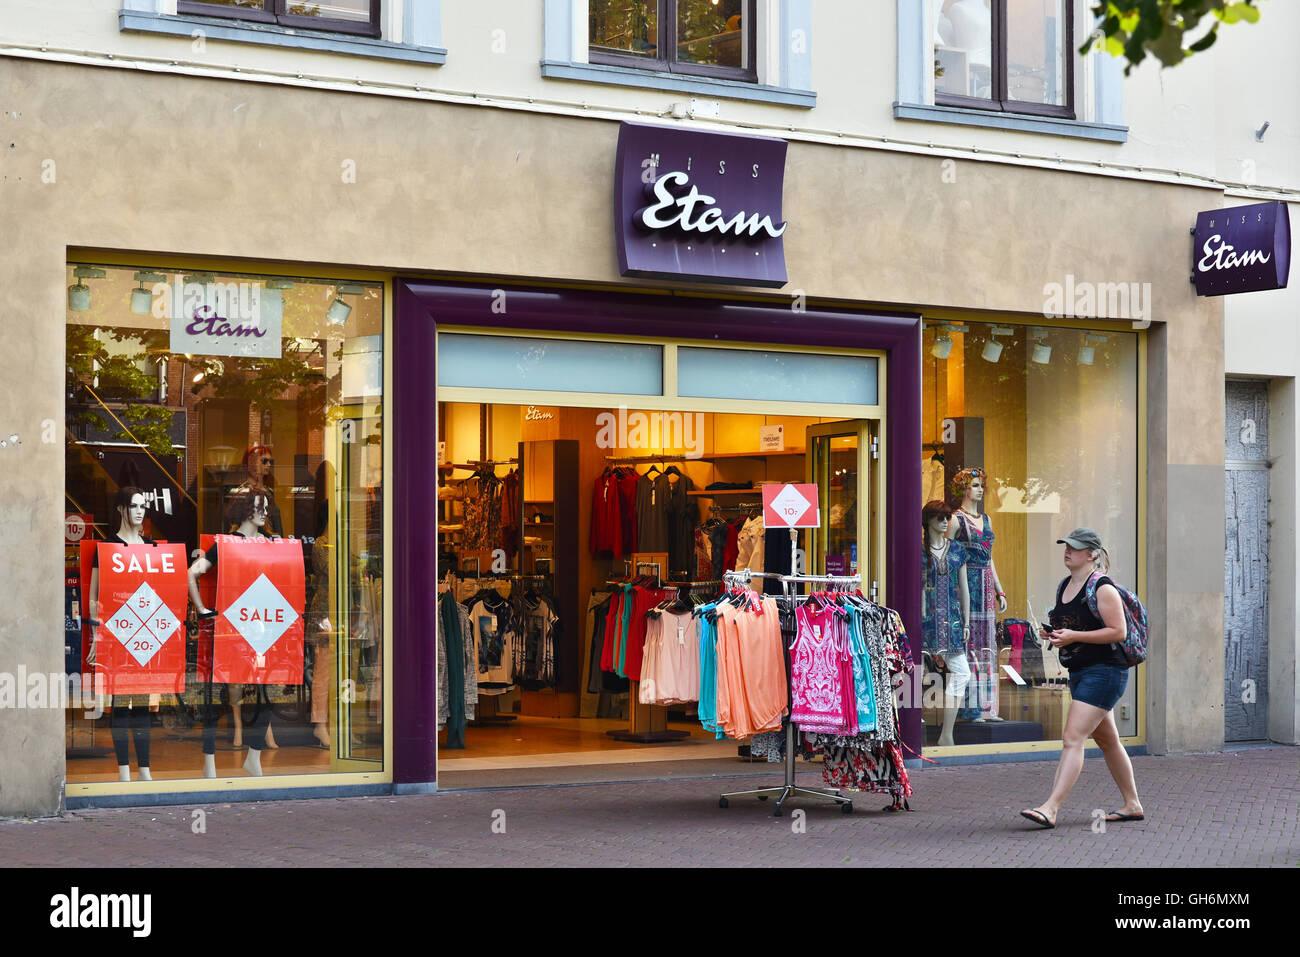 Branch of Miss Etam ladies Fashion stores - Stock Image